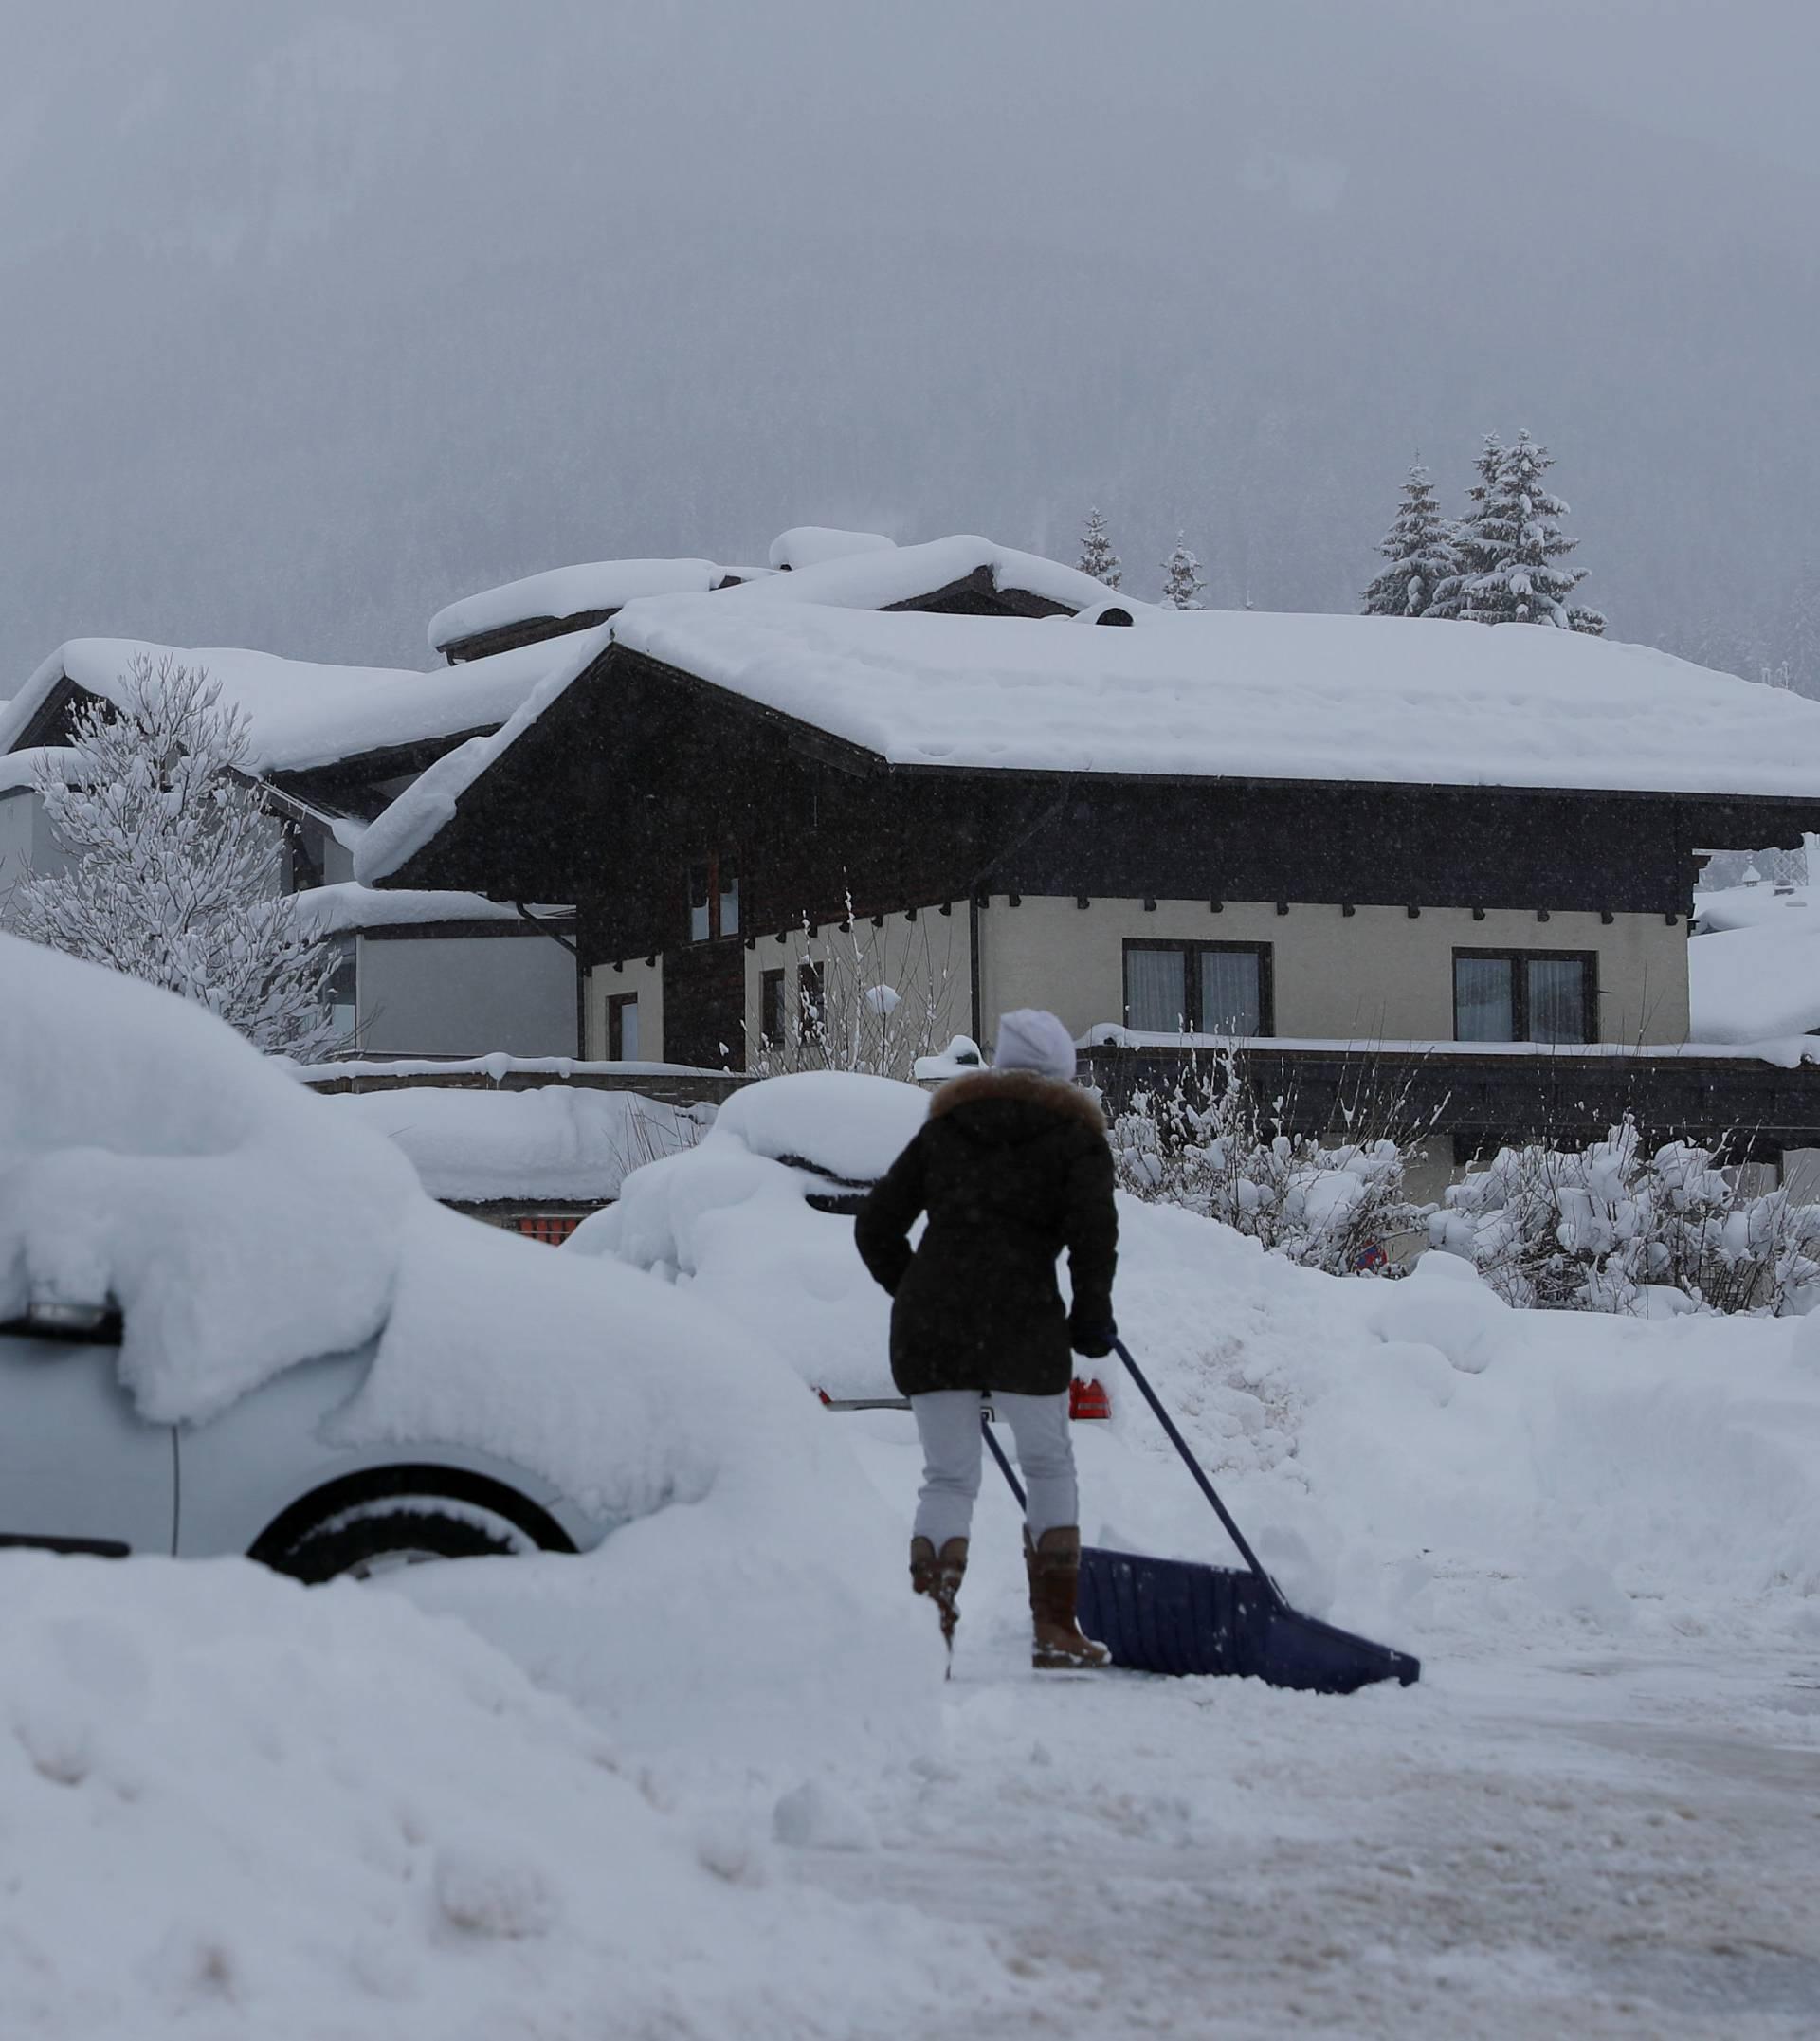 A woman shovels snow on a road after heavy snowfall in Flachau